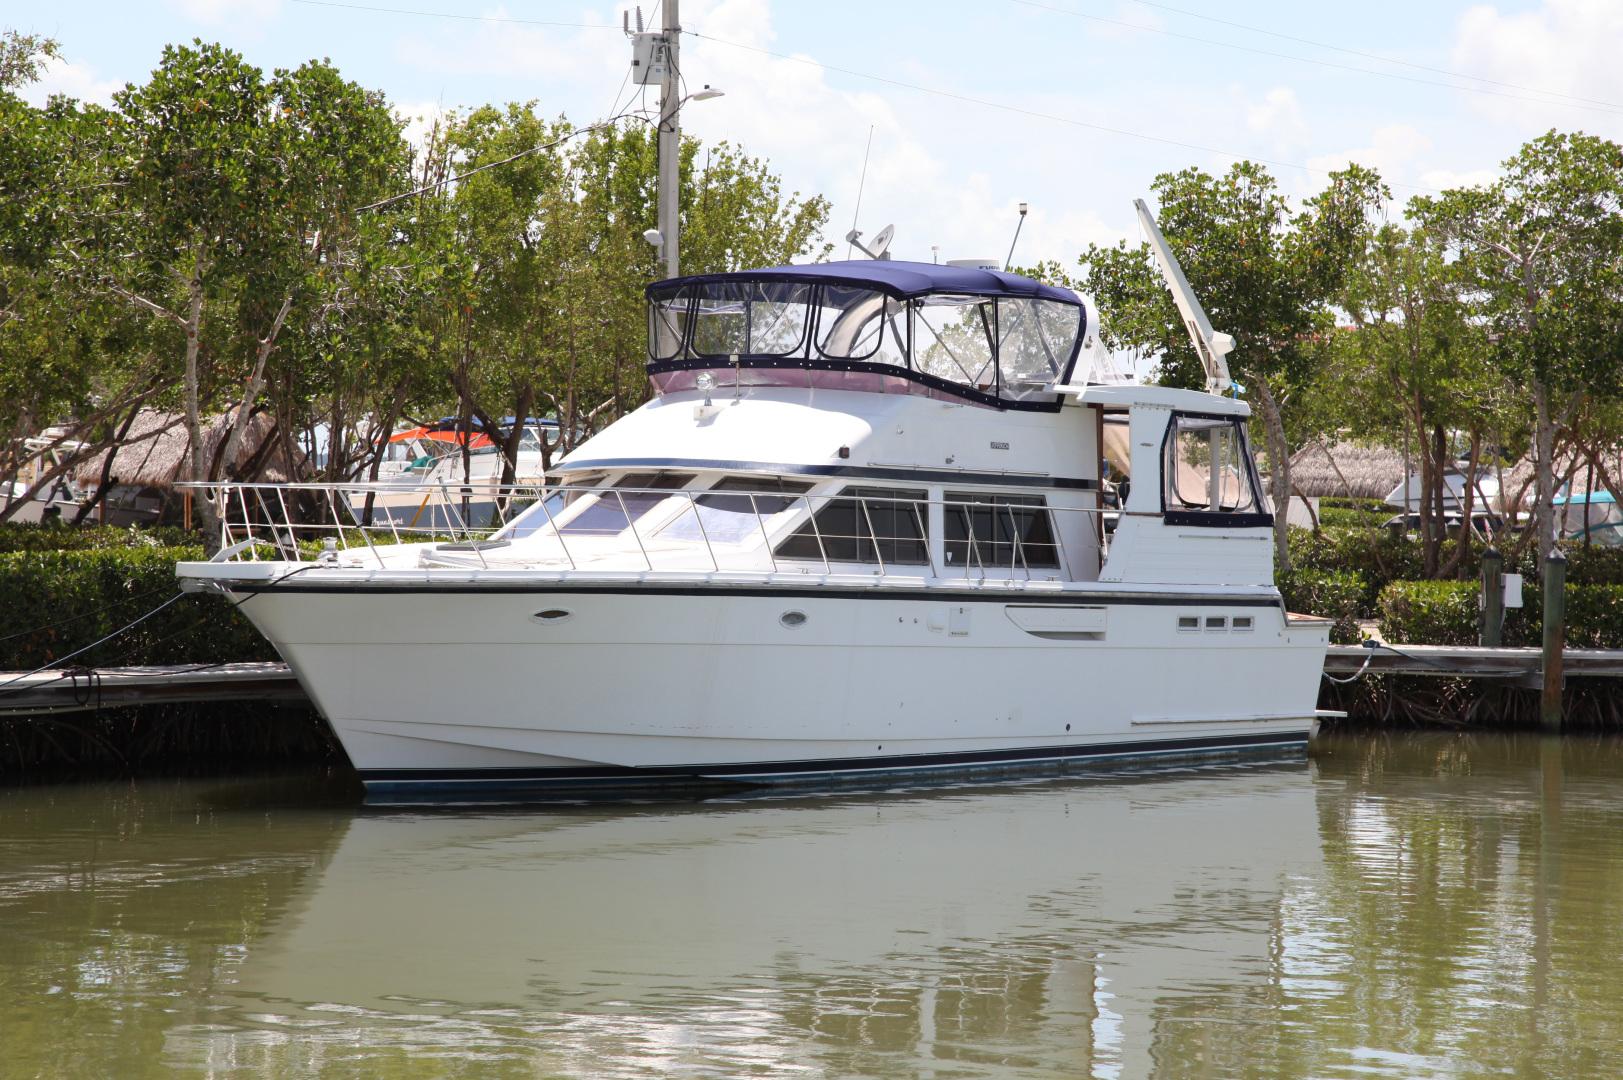 Jefferson-Rivanna 52 CMY 1994-Sea Dream Key Largo-Florida-United States-1074556 | Thumbnail